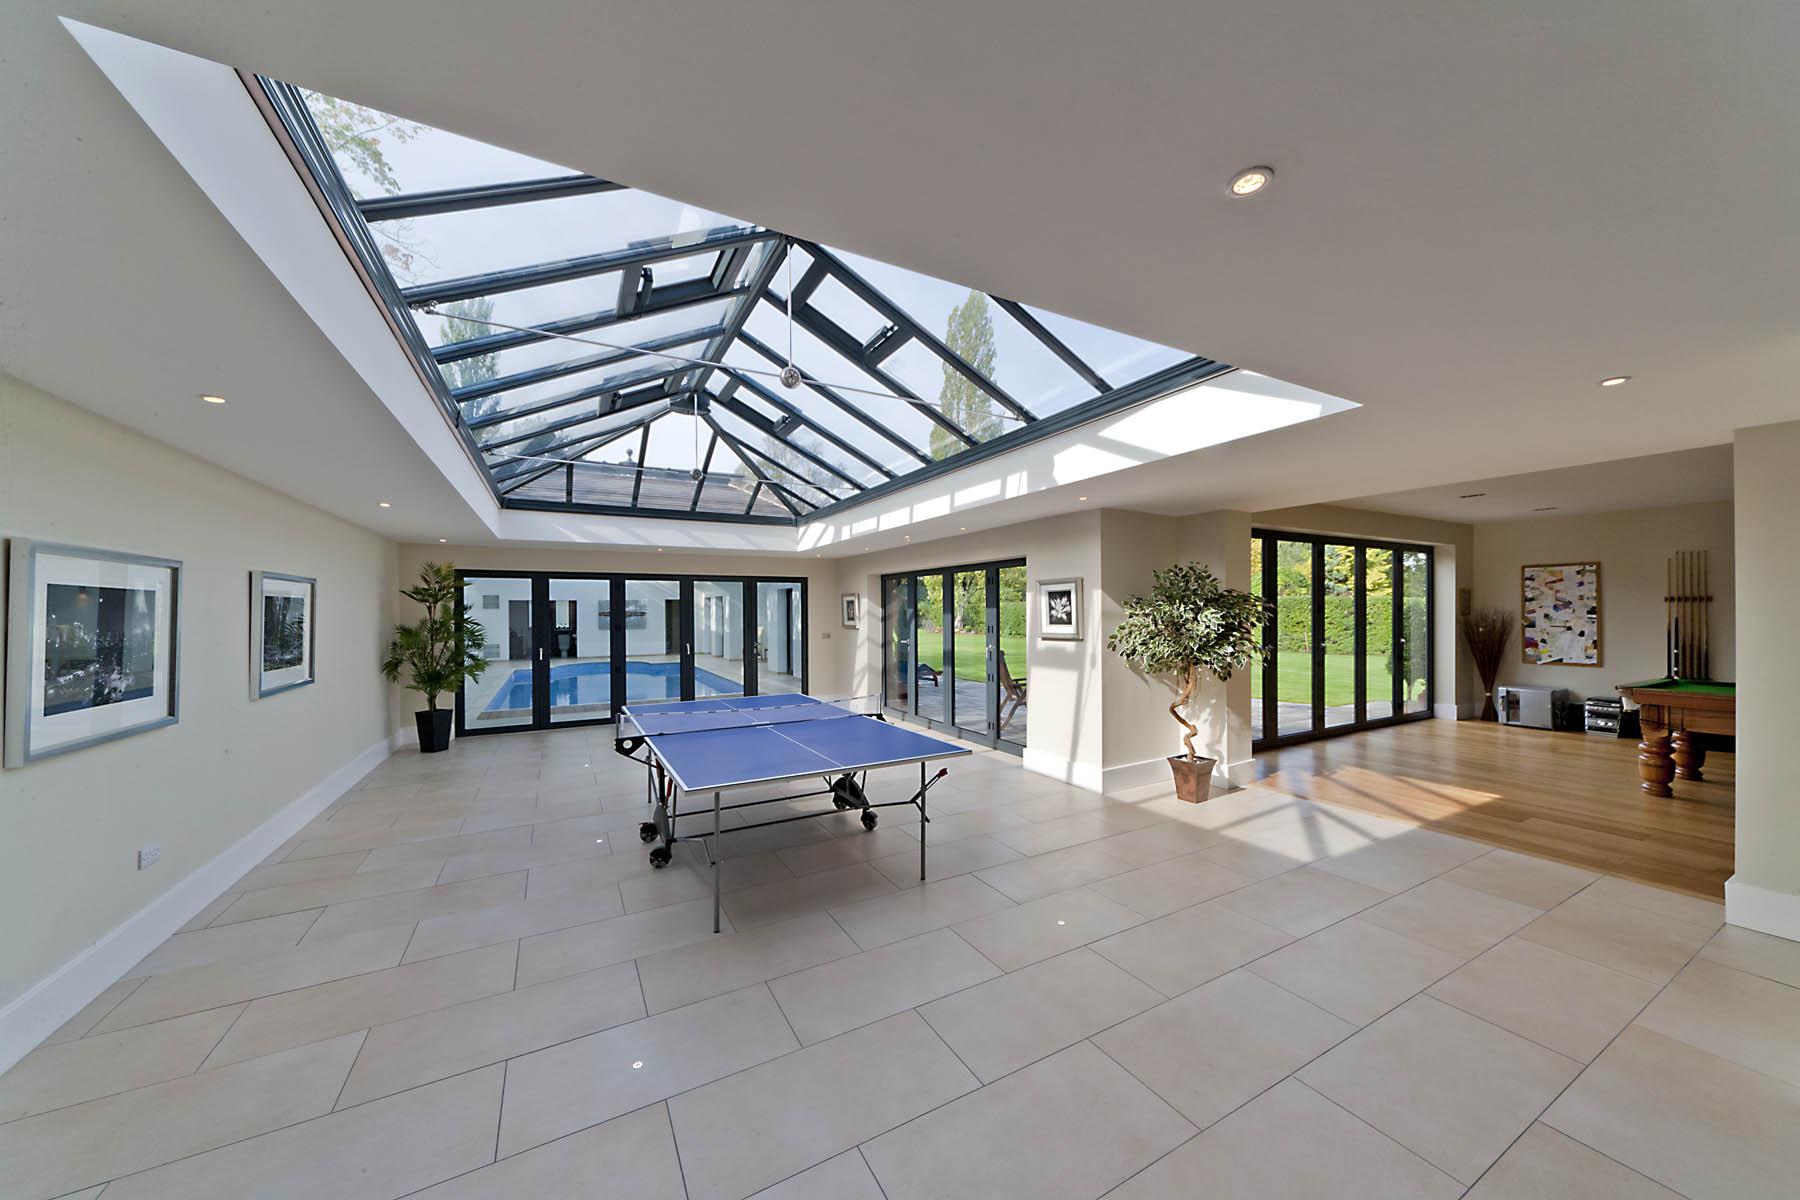 112 Widney Manor Road Solihull - Interior